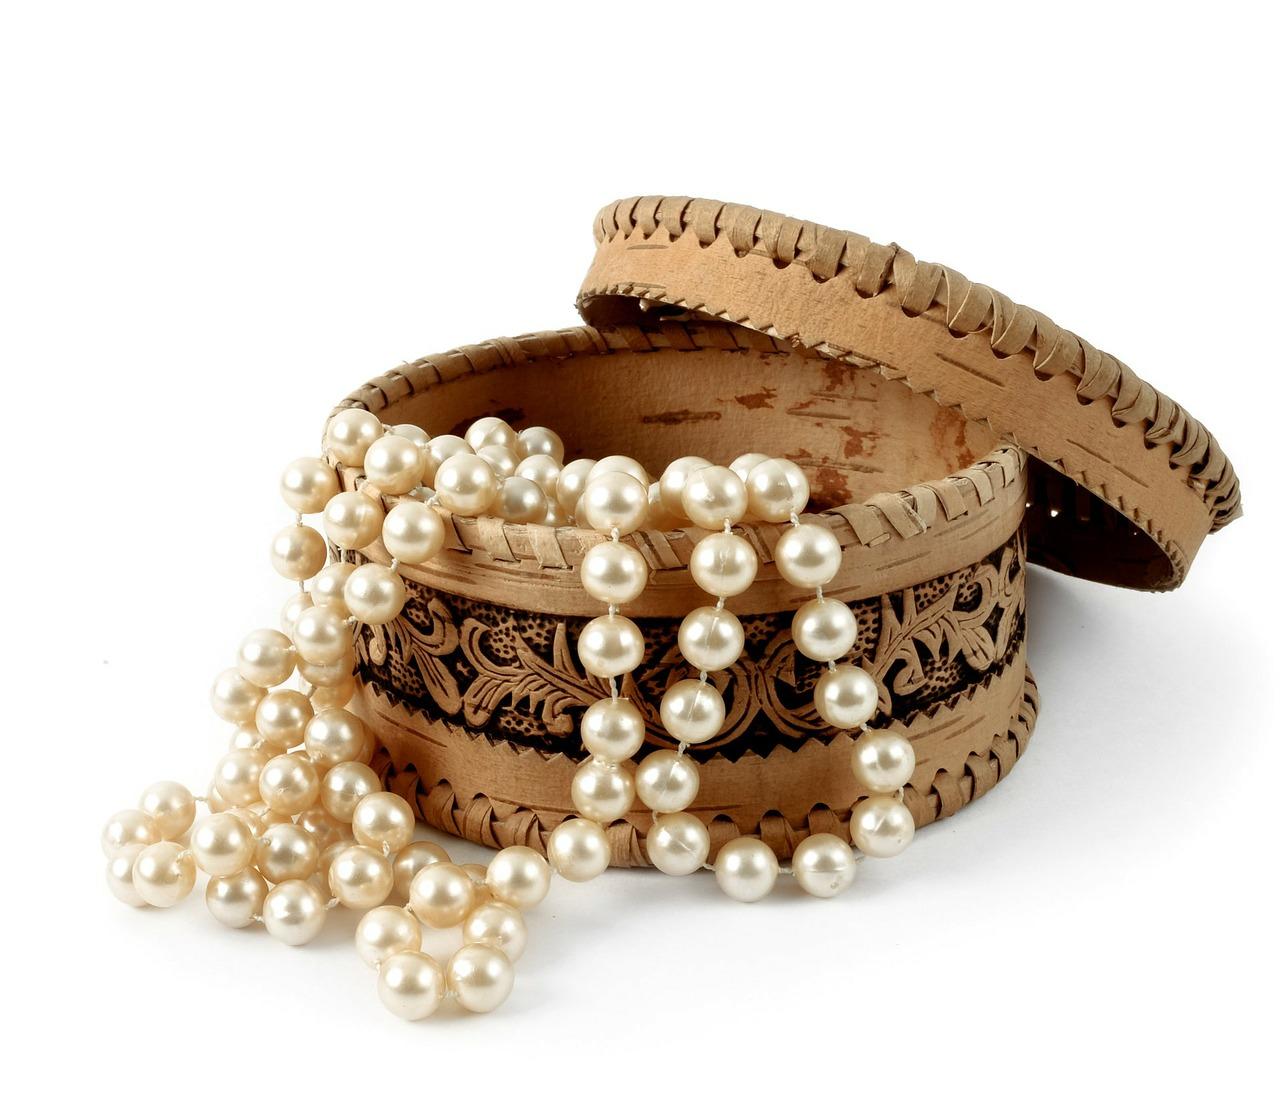 jewelry-box-164134_1280